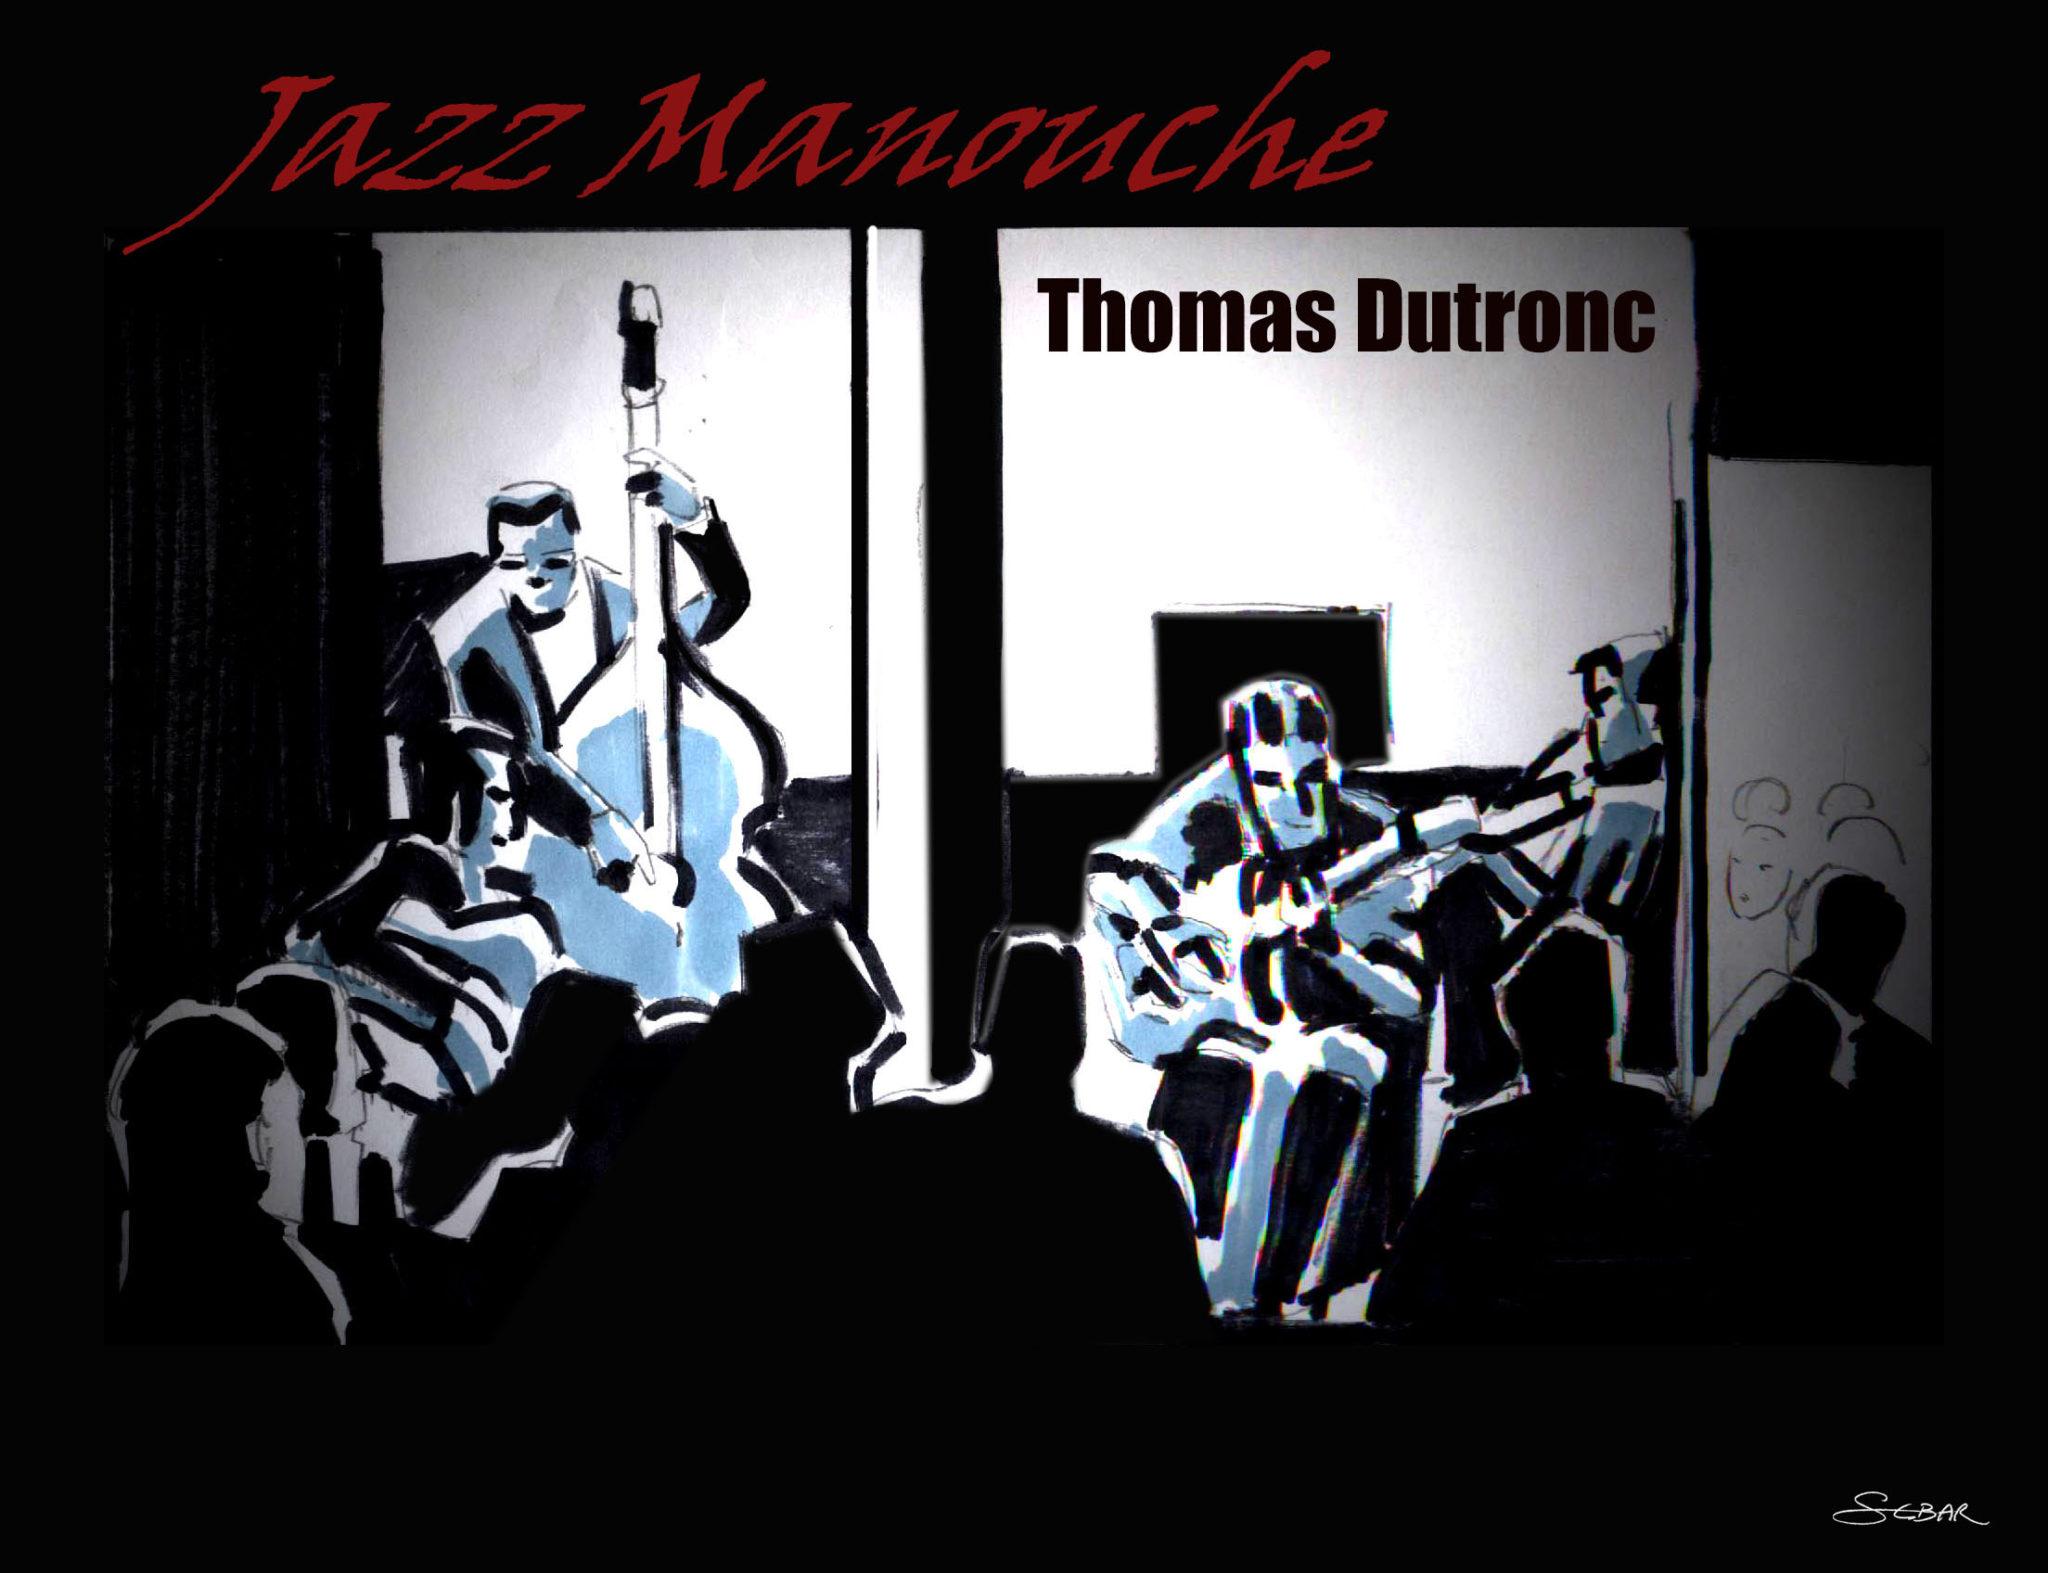 jazz manouche 002 cadre titre copie